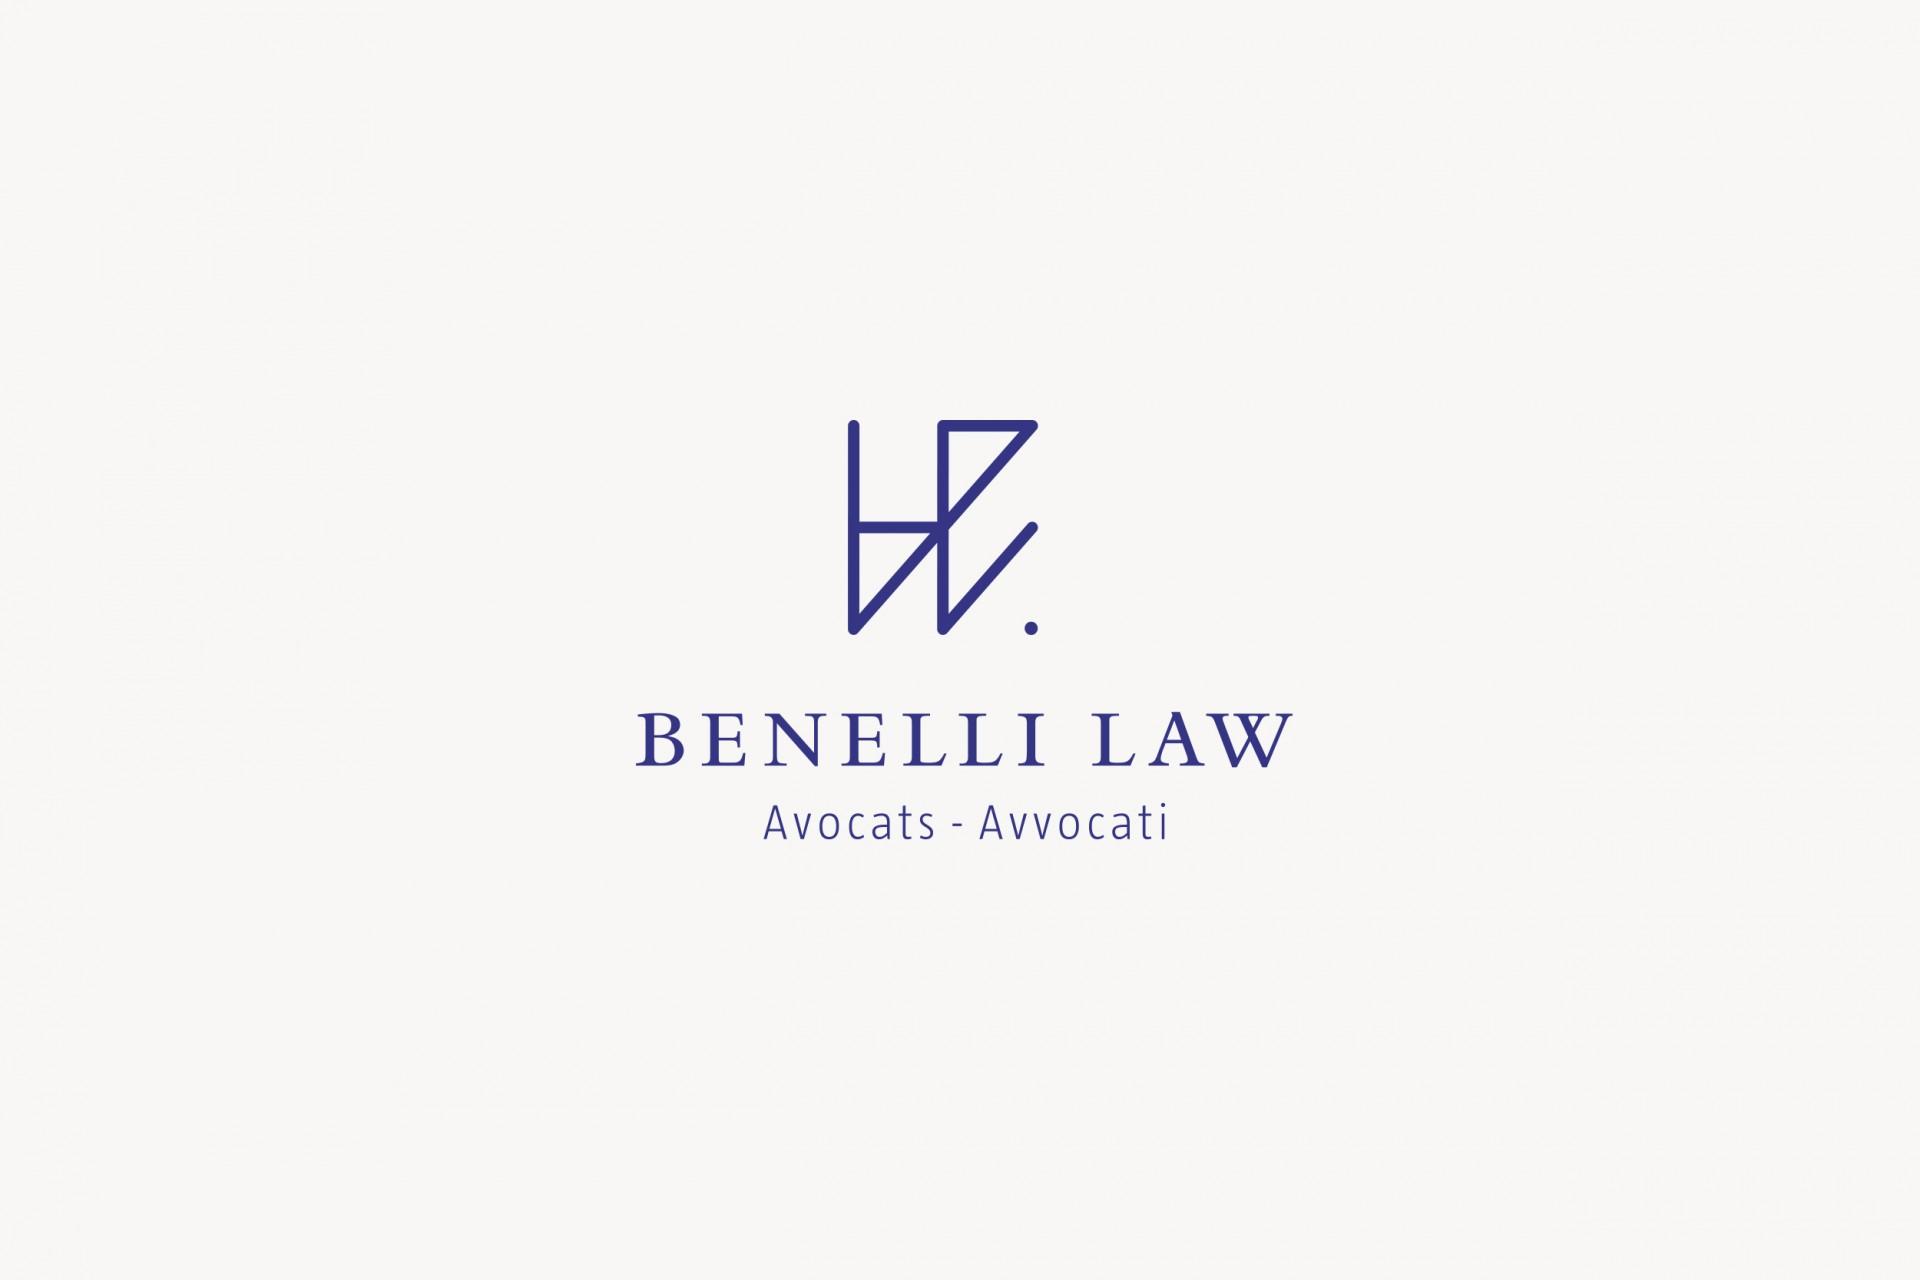 Adèle H. Benelli Law